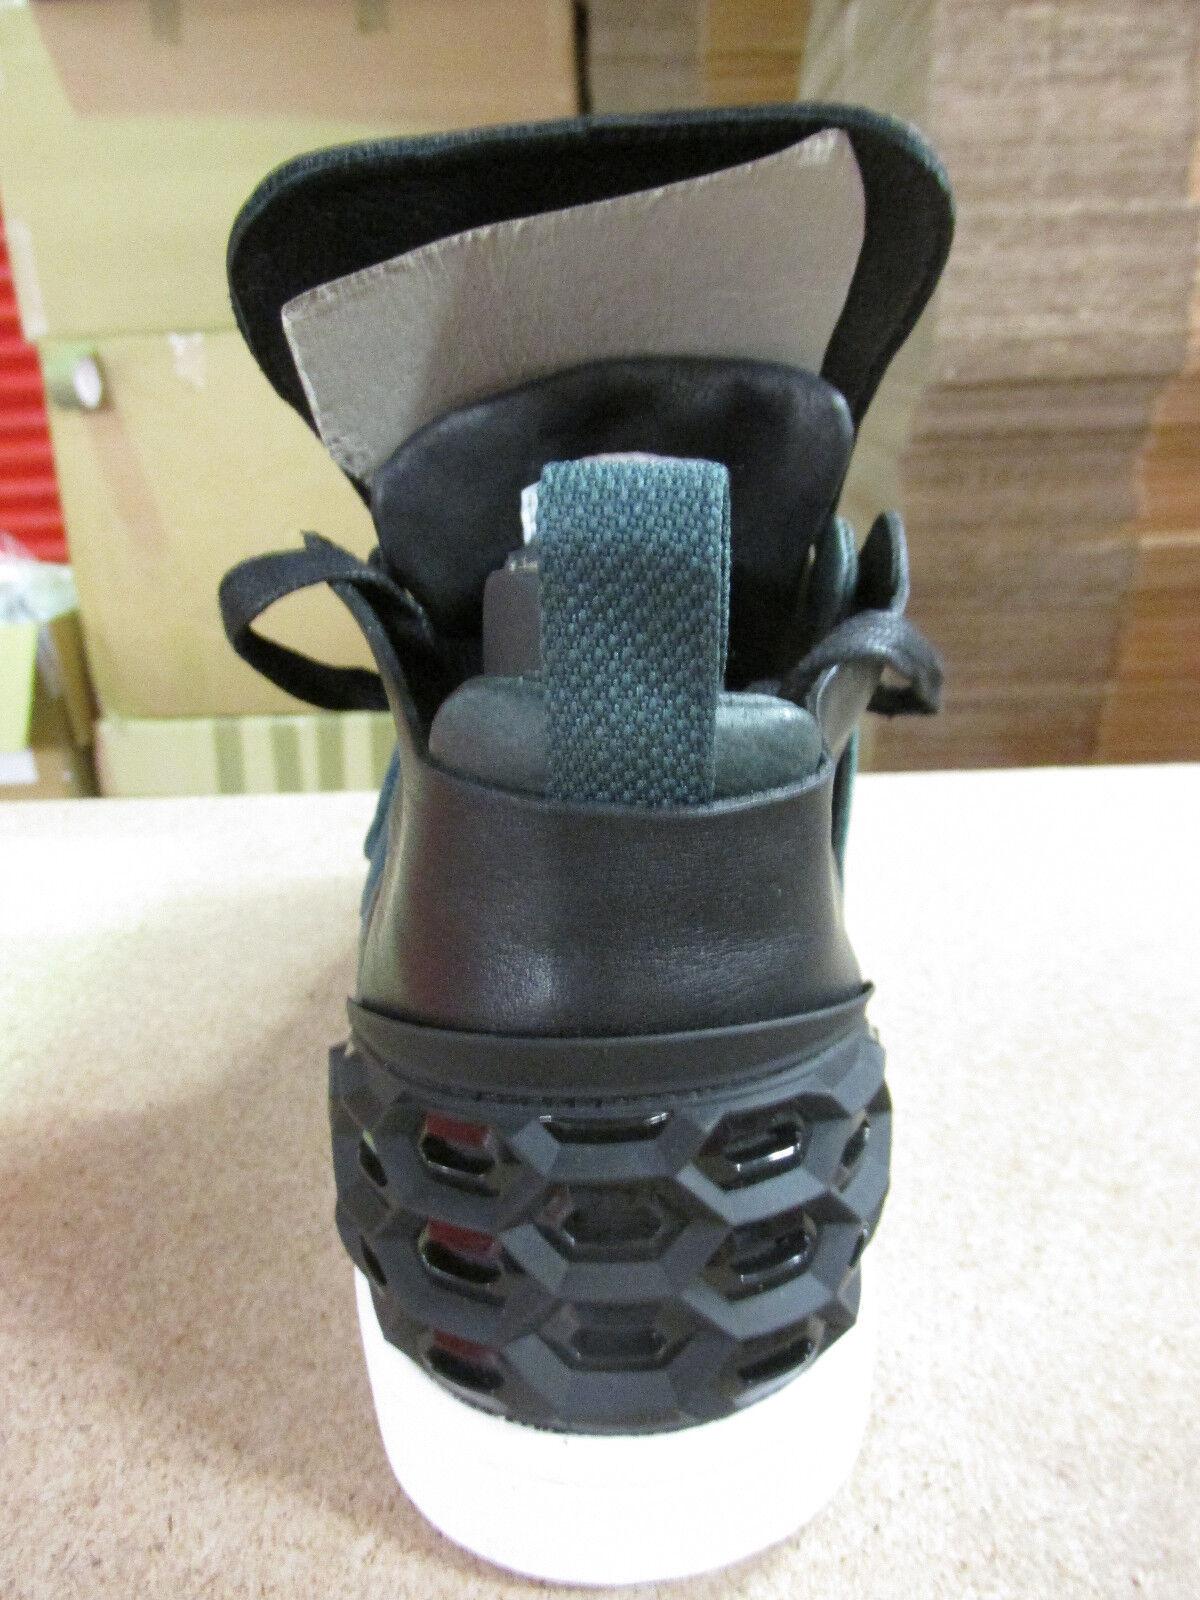 Nike Tiempo Vetta Vetta Vetta QS Hommes Trainers 845045 300 Baskets Chaussures bf5381